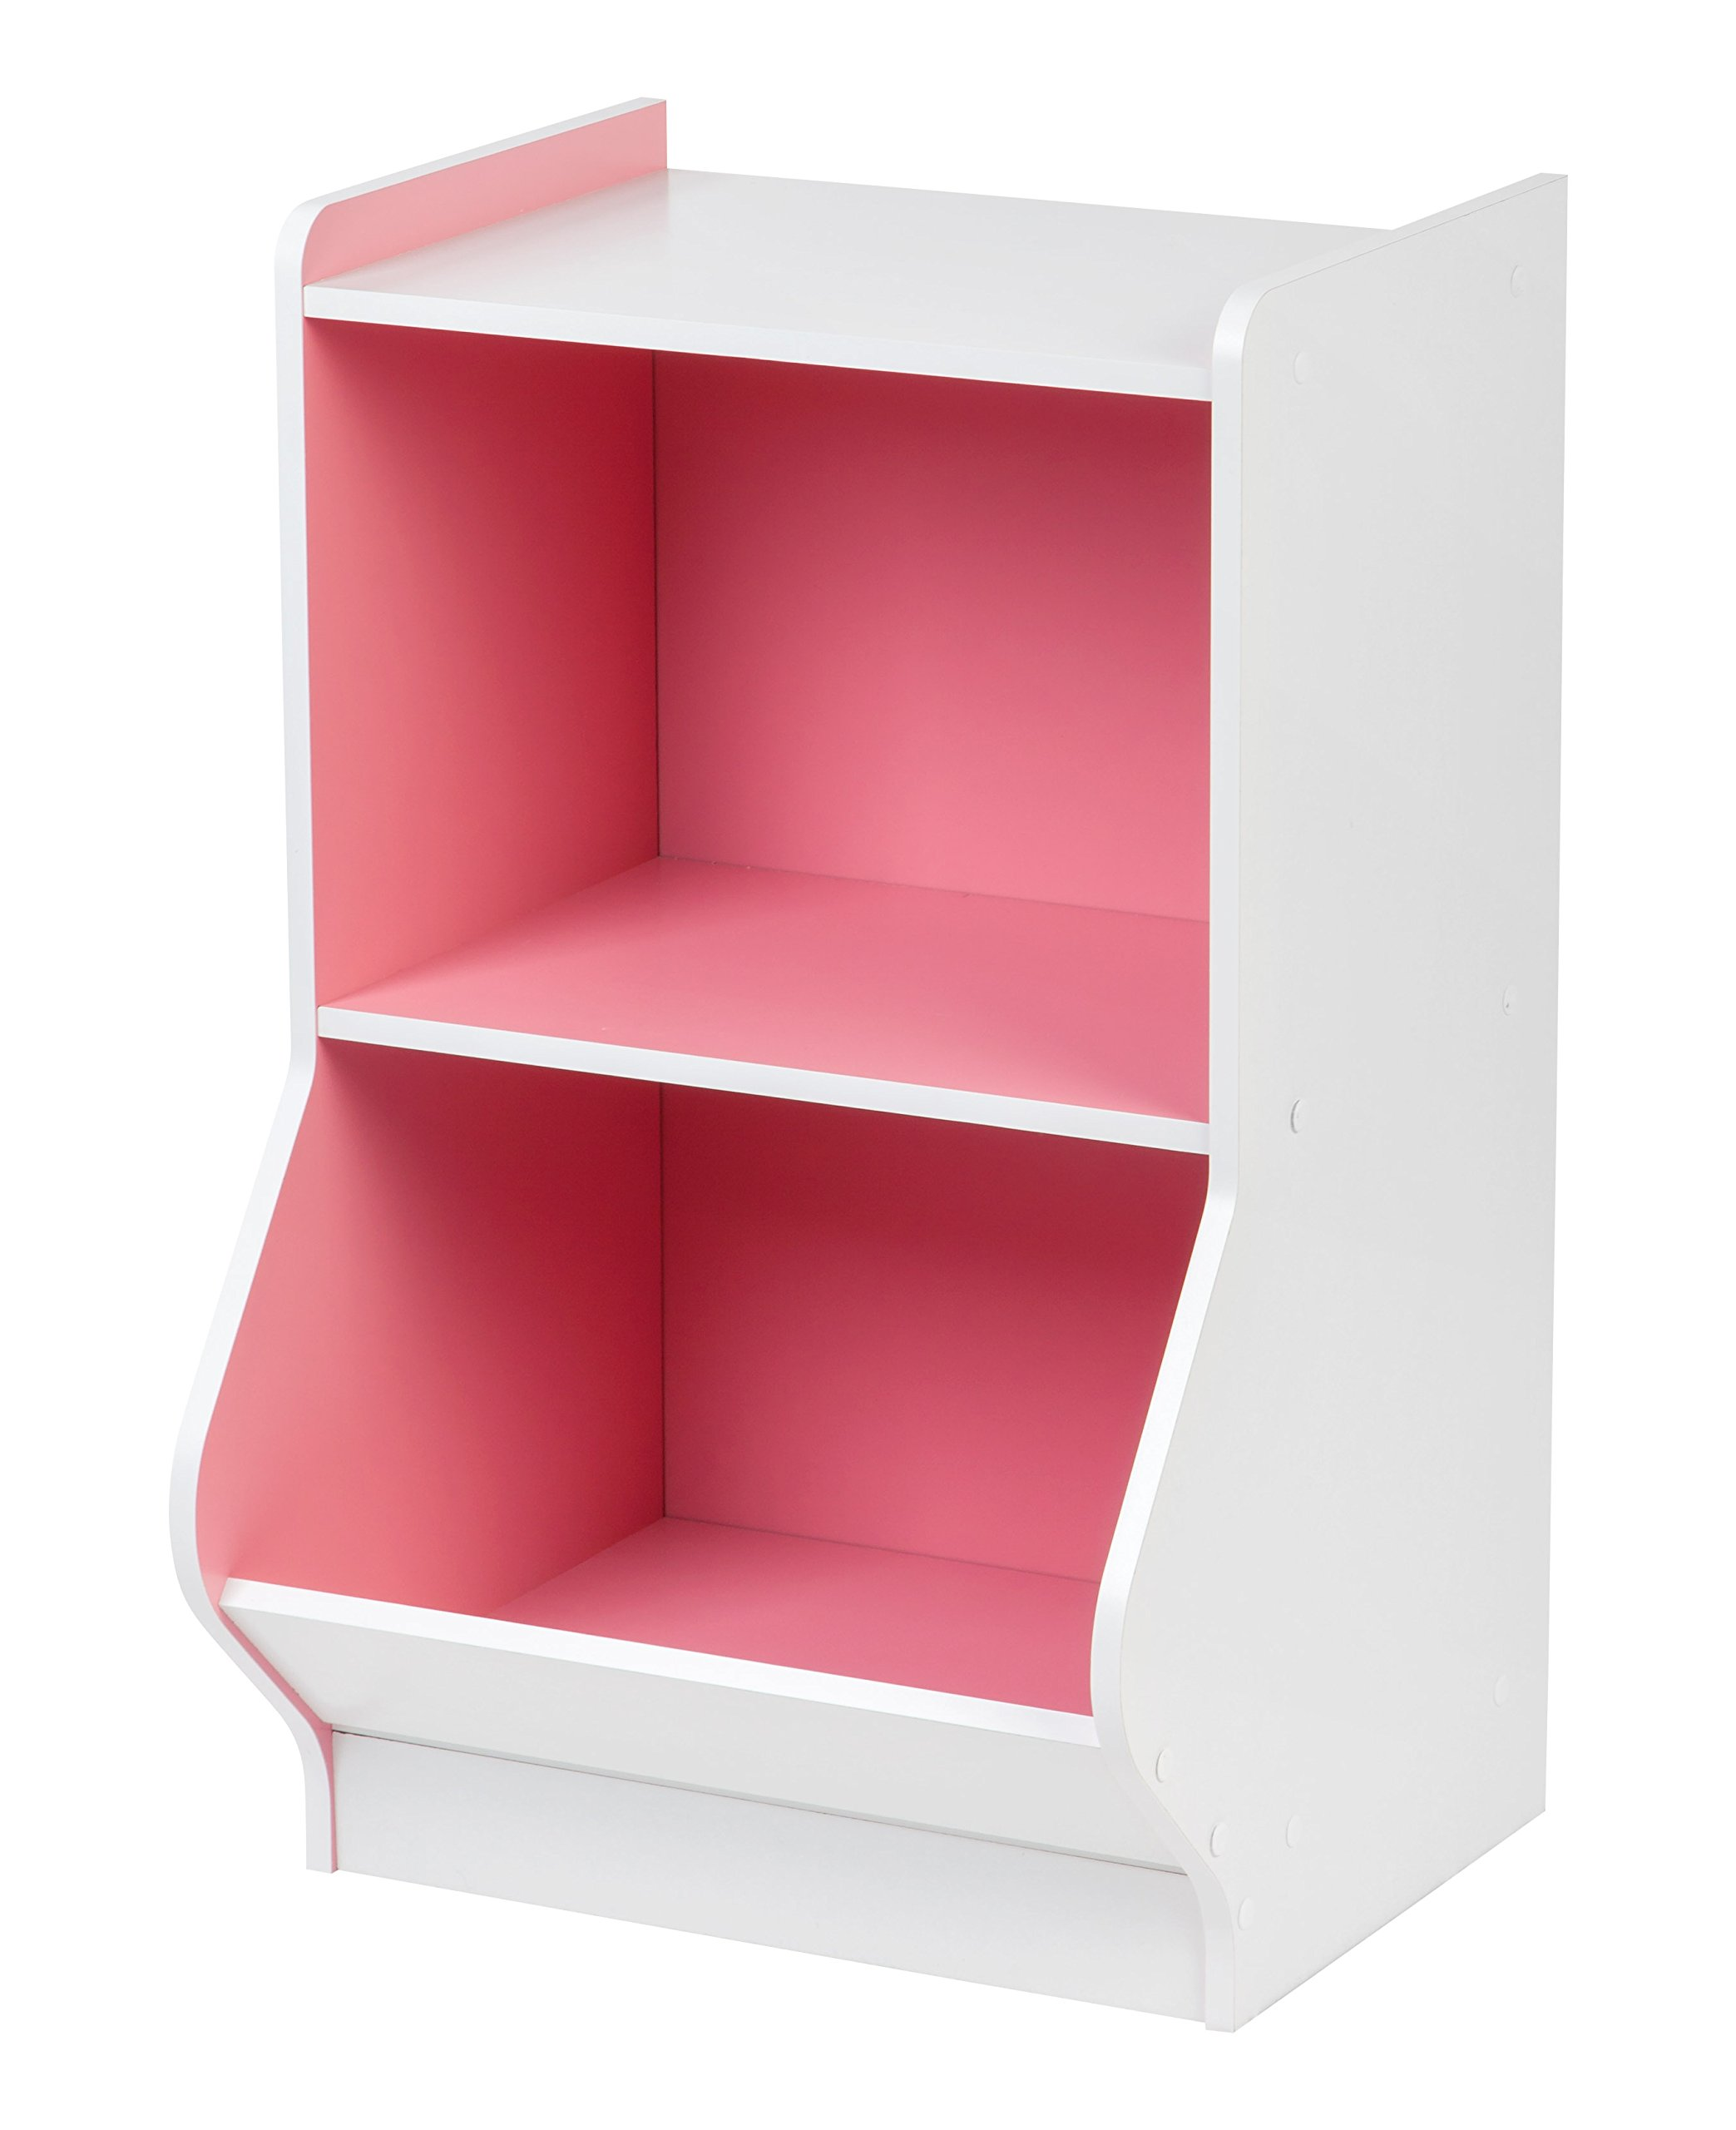 IRIS 2-Tier Storage Organizer Shelf with Footboard, White and Pink